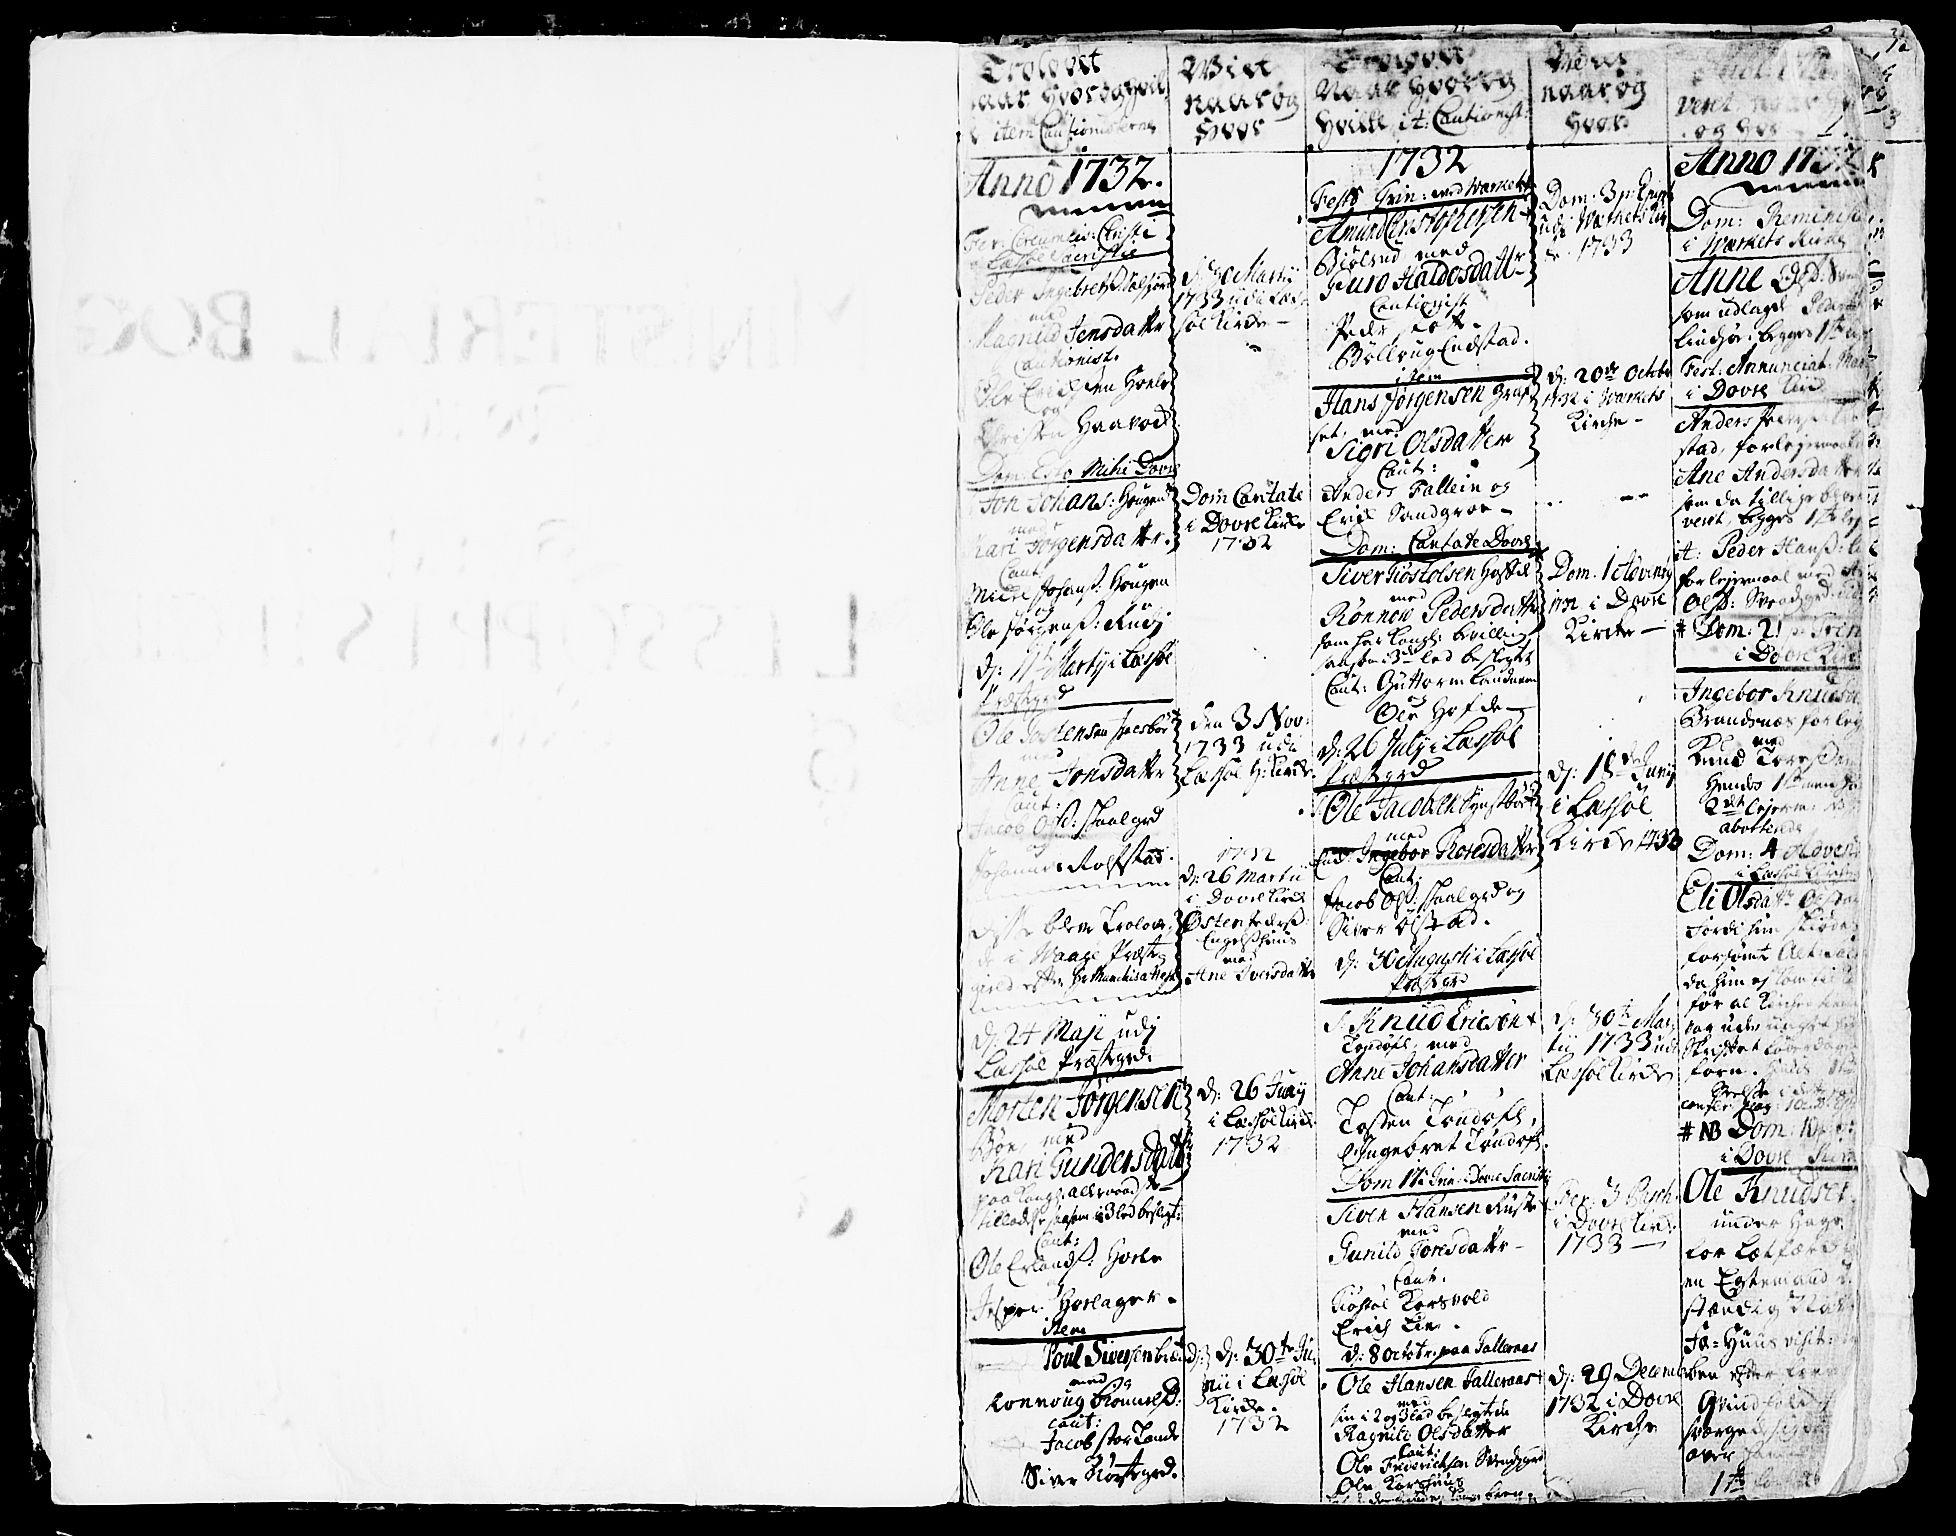 SAH, Lesja prestekontor, Ministerialbok nr. 2, 1732-1776, s. 0-1